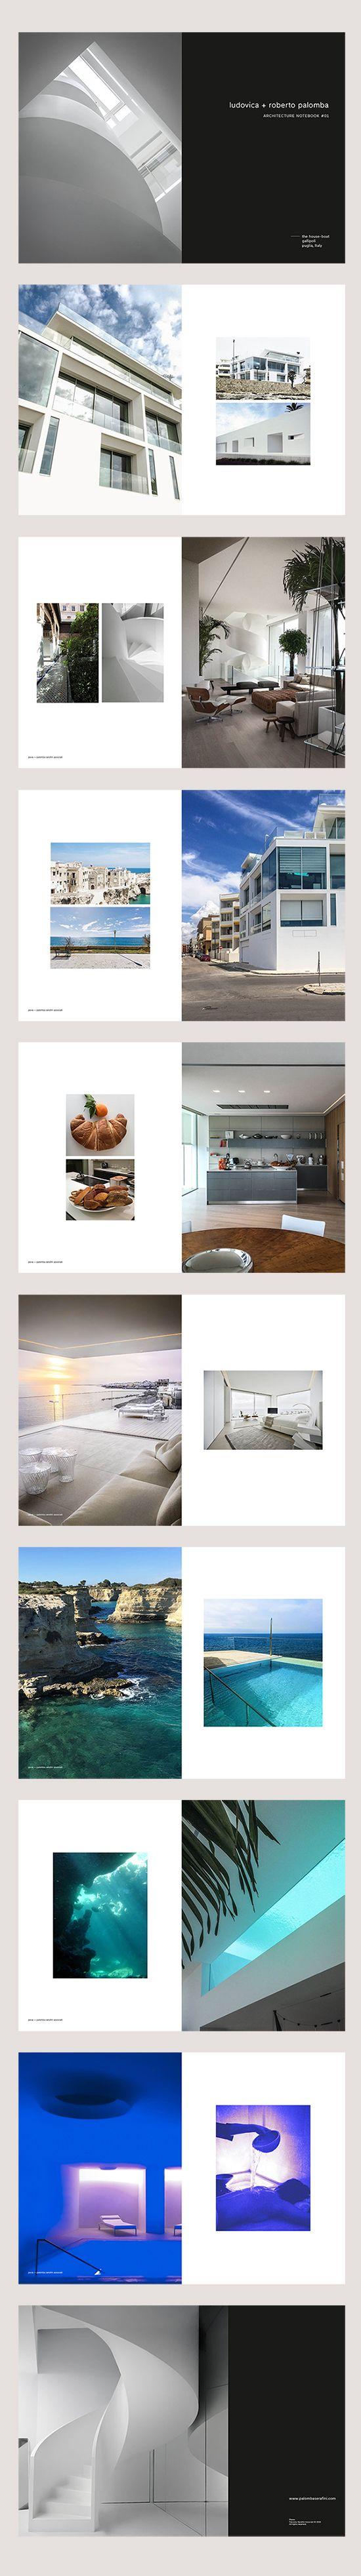 Architecture  #Notebook - Tho boat house - Gallipoli